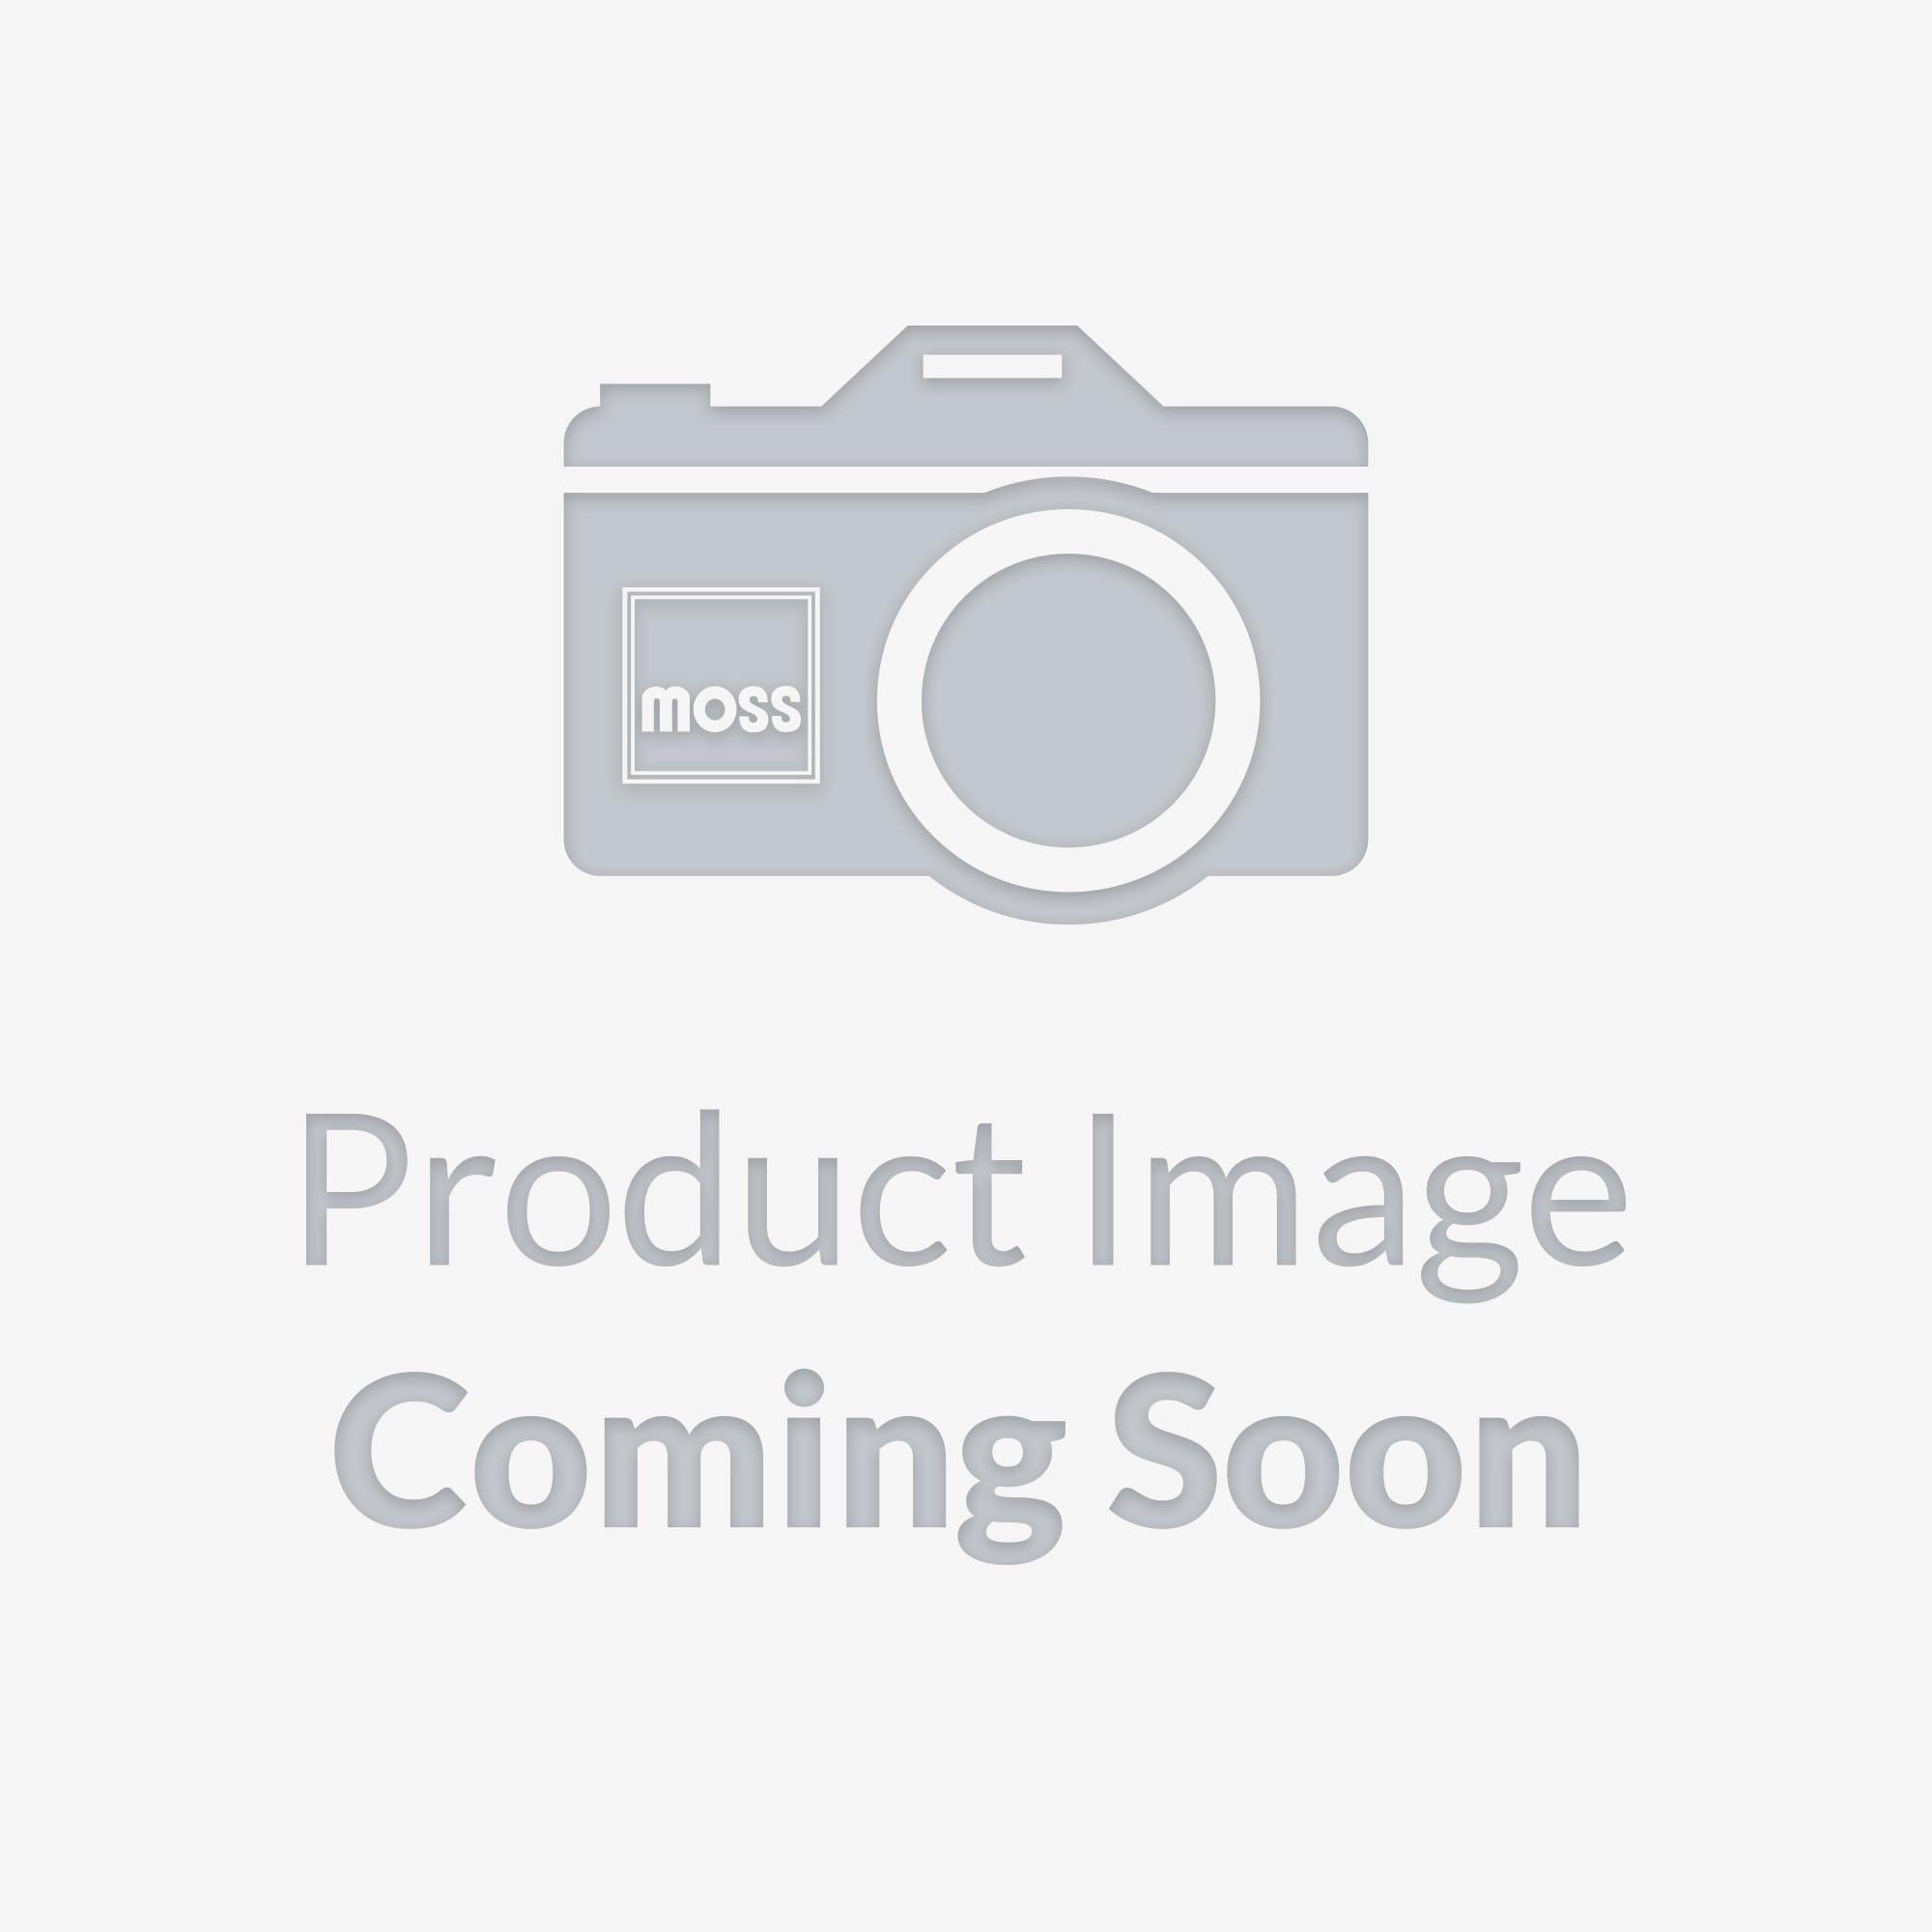 mikuni carburetor conversion kit - carburetors